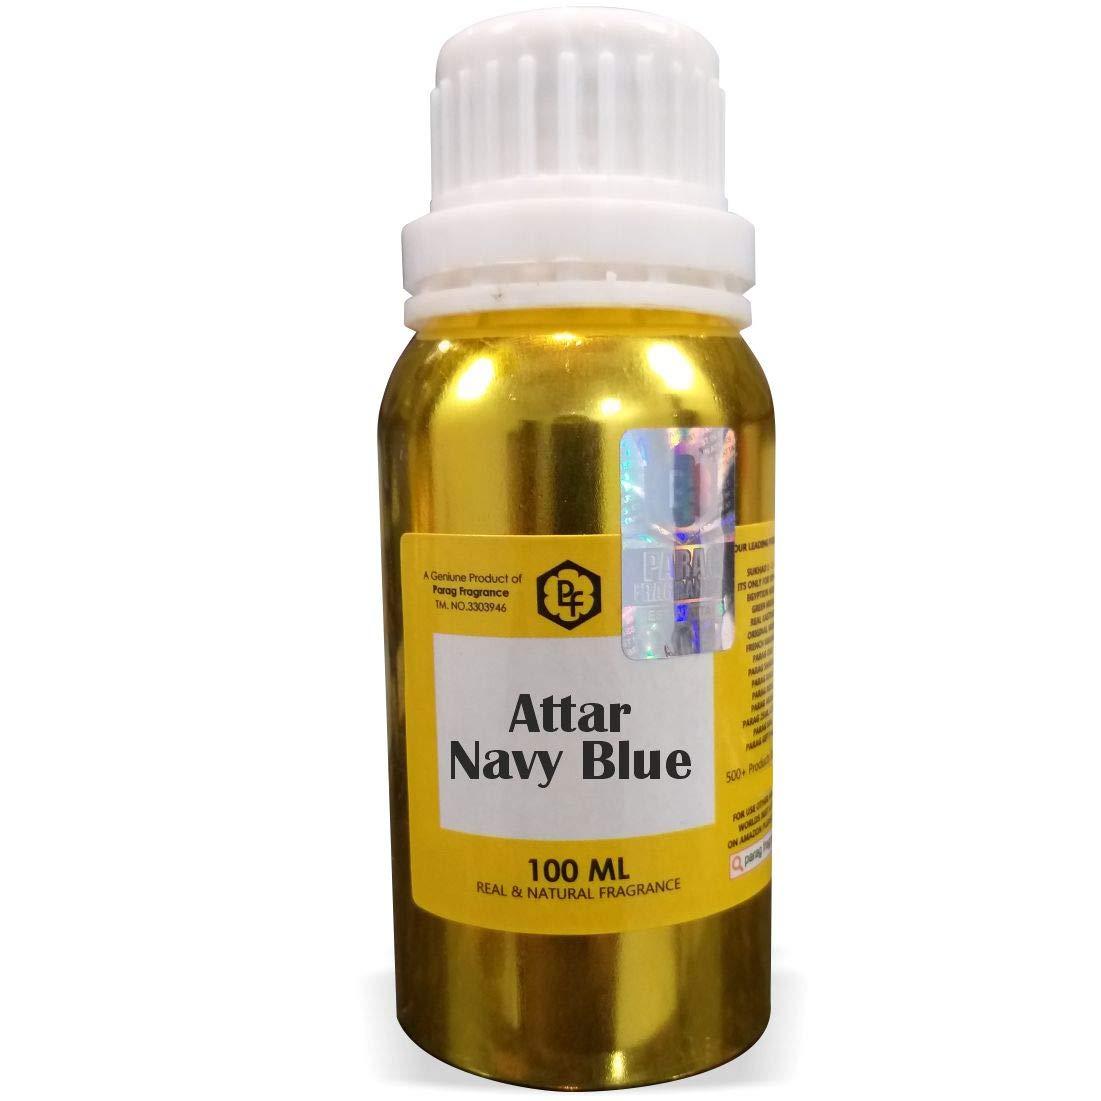 Parag Fragrances Navy Blue Attar 100ml (Alcohol Free Attar For Men) Perfume Oil | Scent | Itra